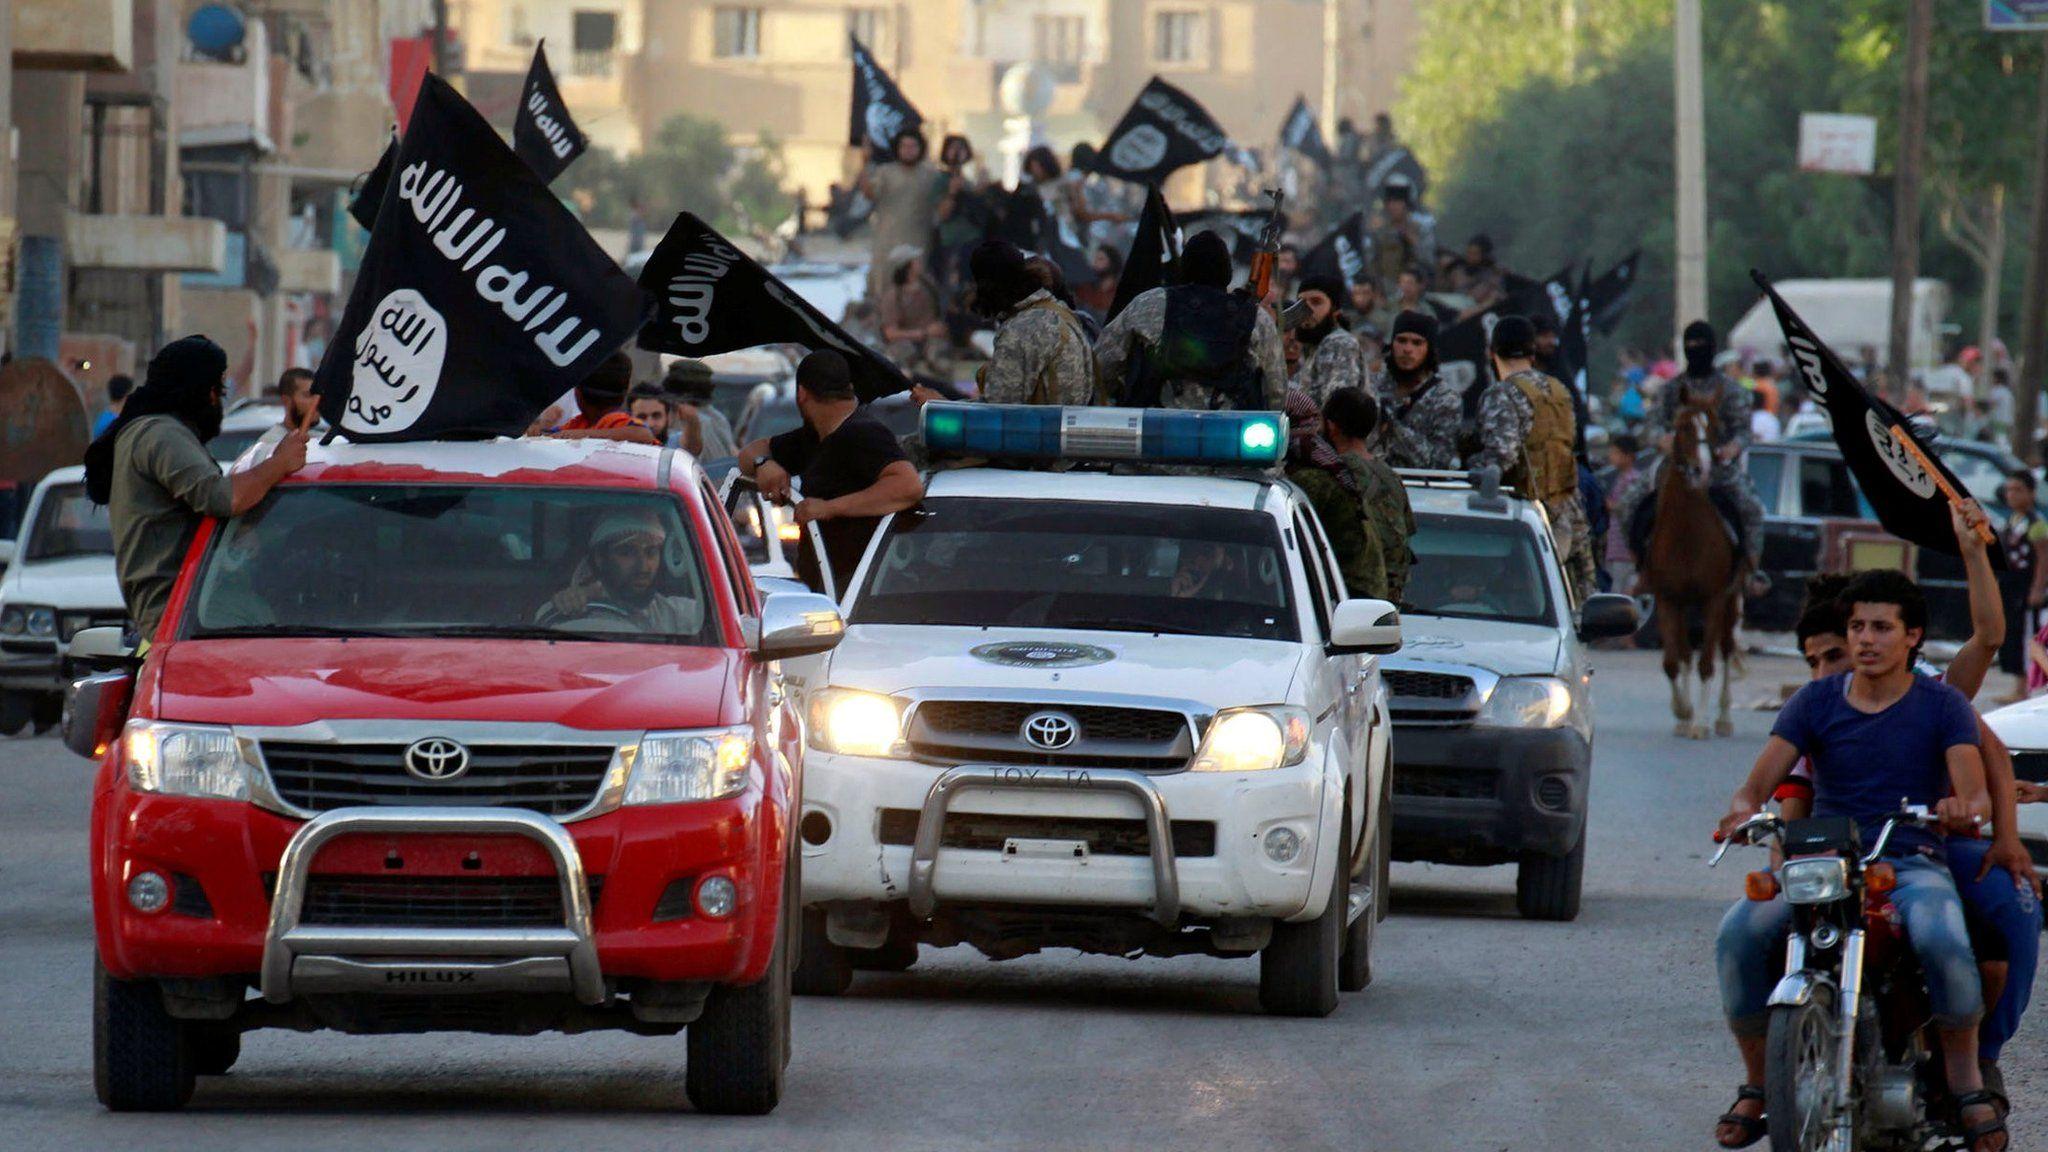 IS militant hold up black jihadist banners in Raqqa on 30 June 2014